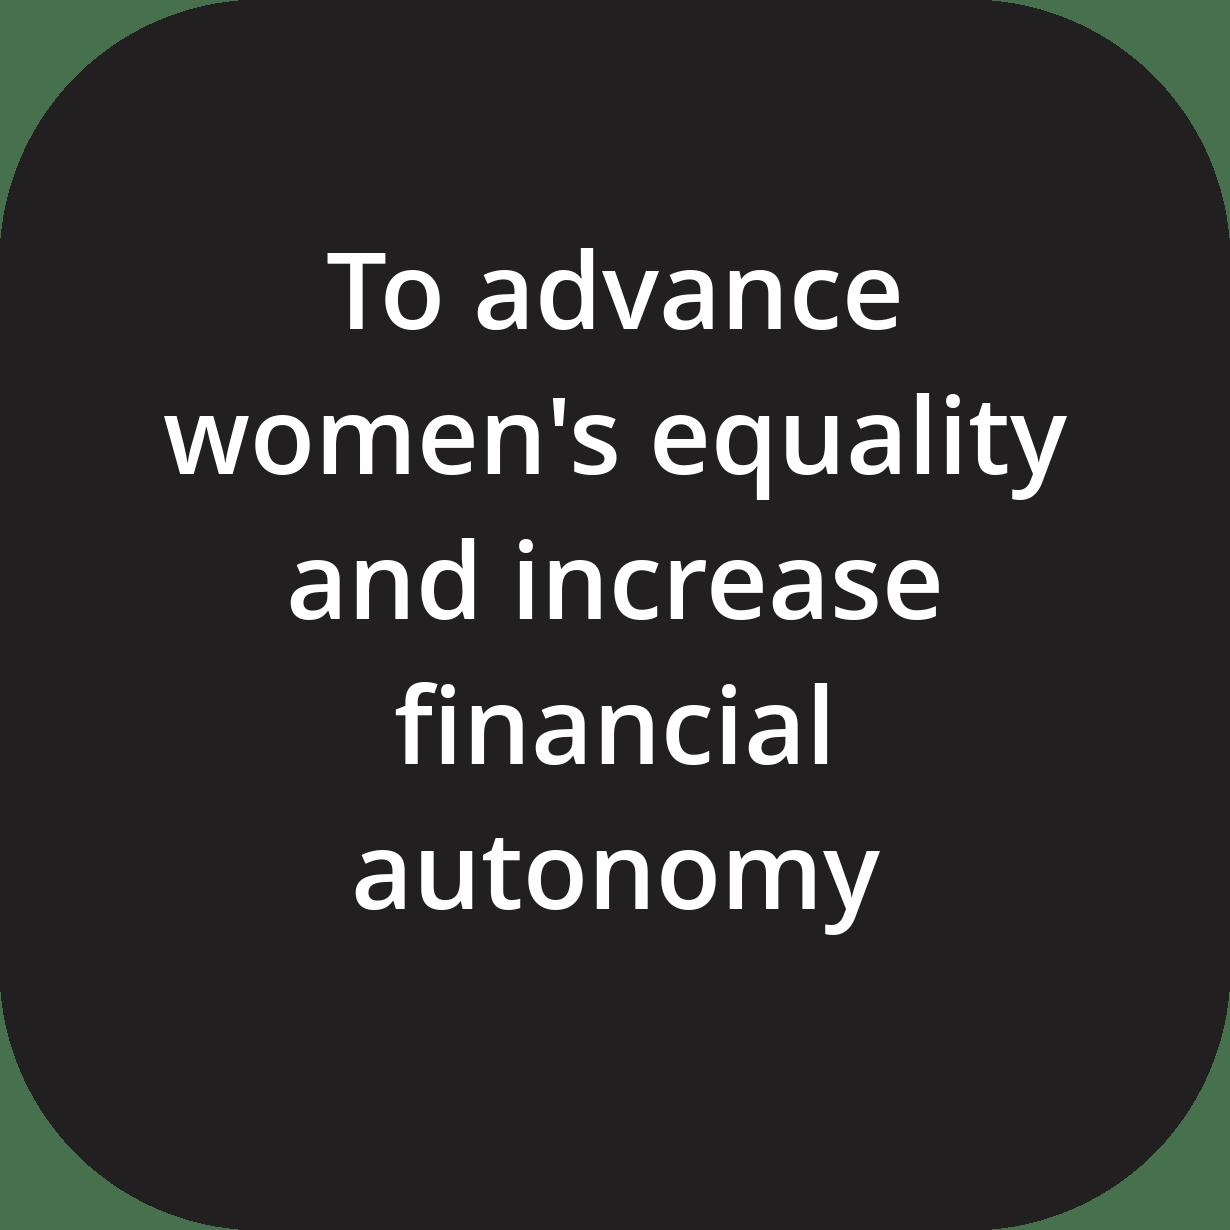 womensequality